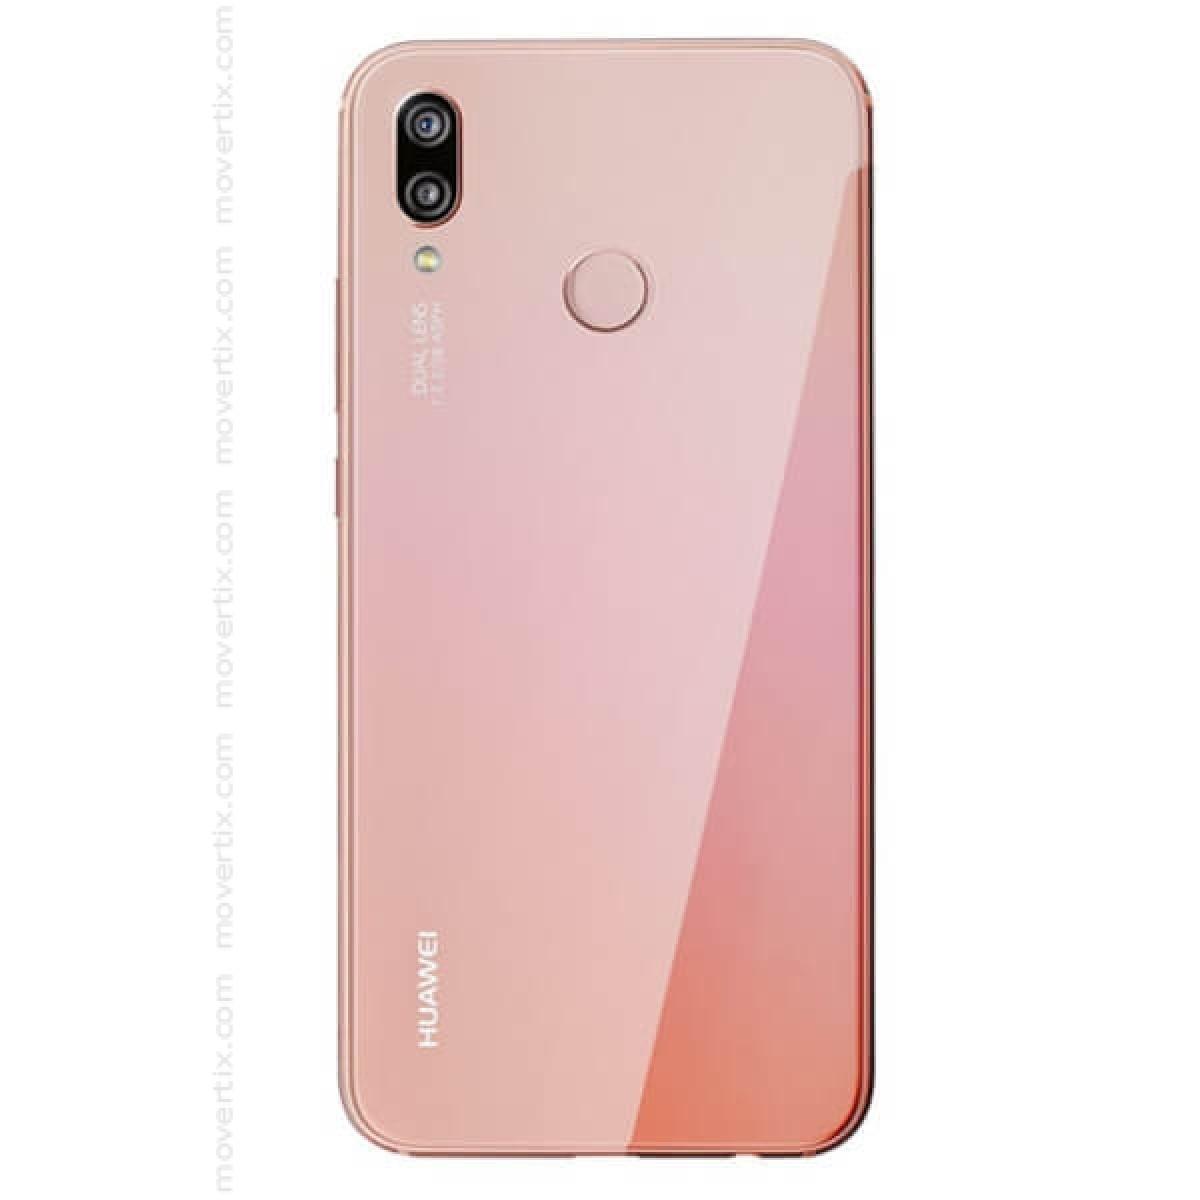 Huawei P20 Lite Dual SIM Pink (ANE-LX1)